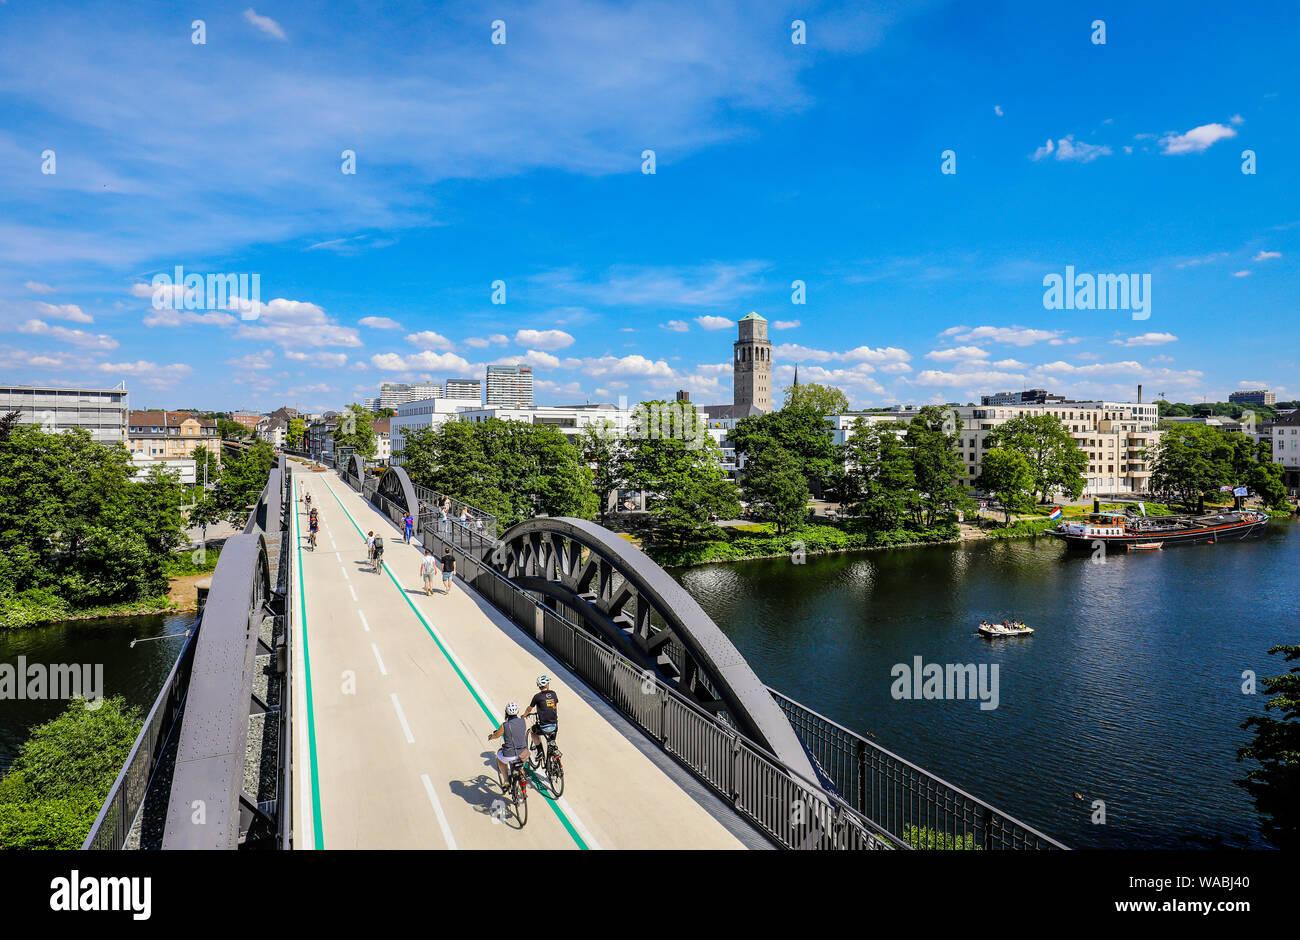 Muelheim an der Ruhr, Ruhr area, North Rhine-Westphalia, Germany - Bicycle highway, Ruhr RS1 express way, leads in Muelheim on a former railway bridge Stock Photo